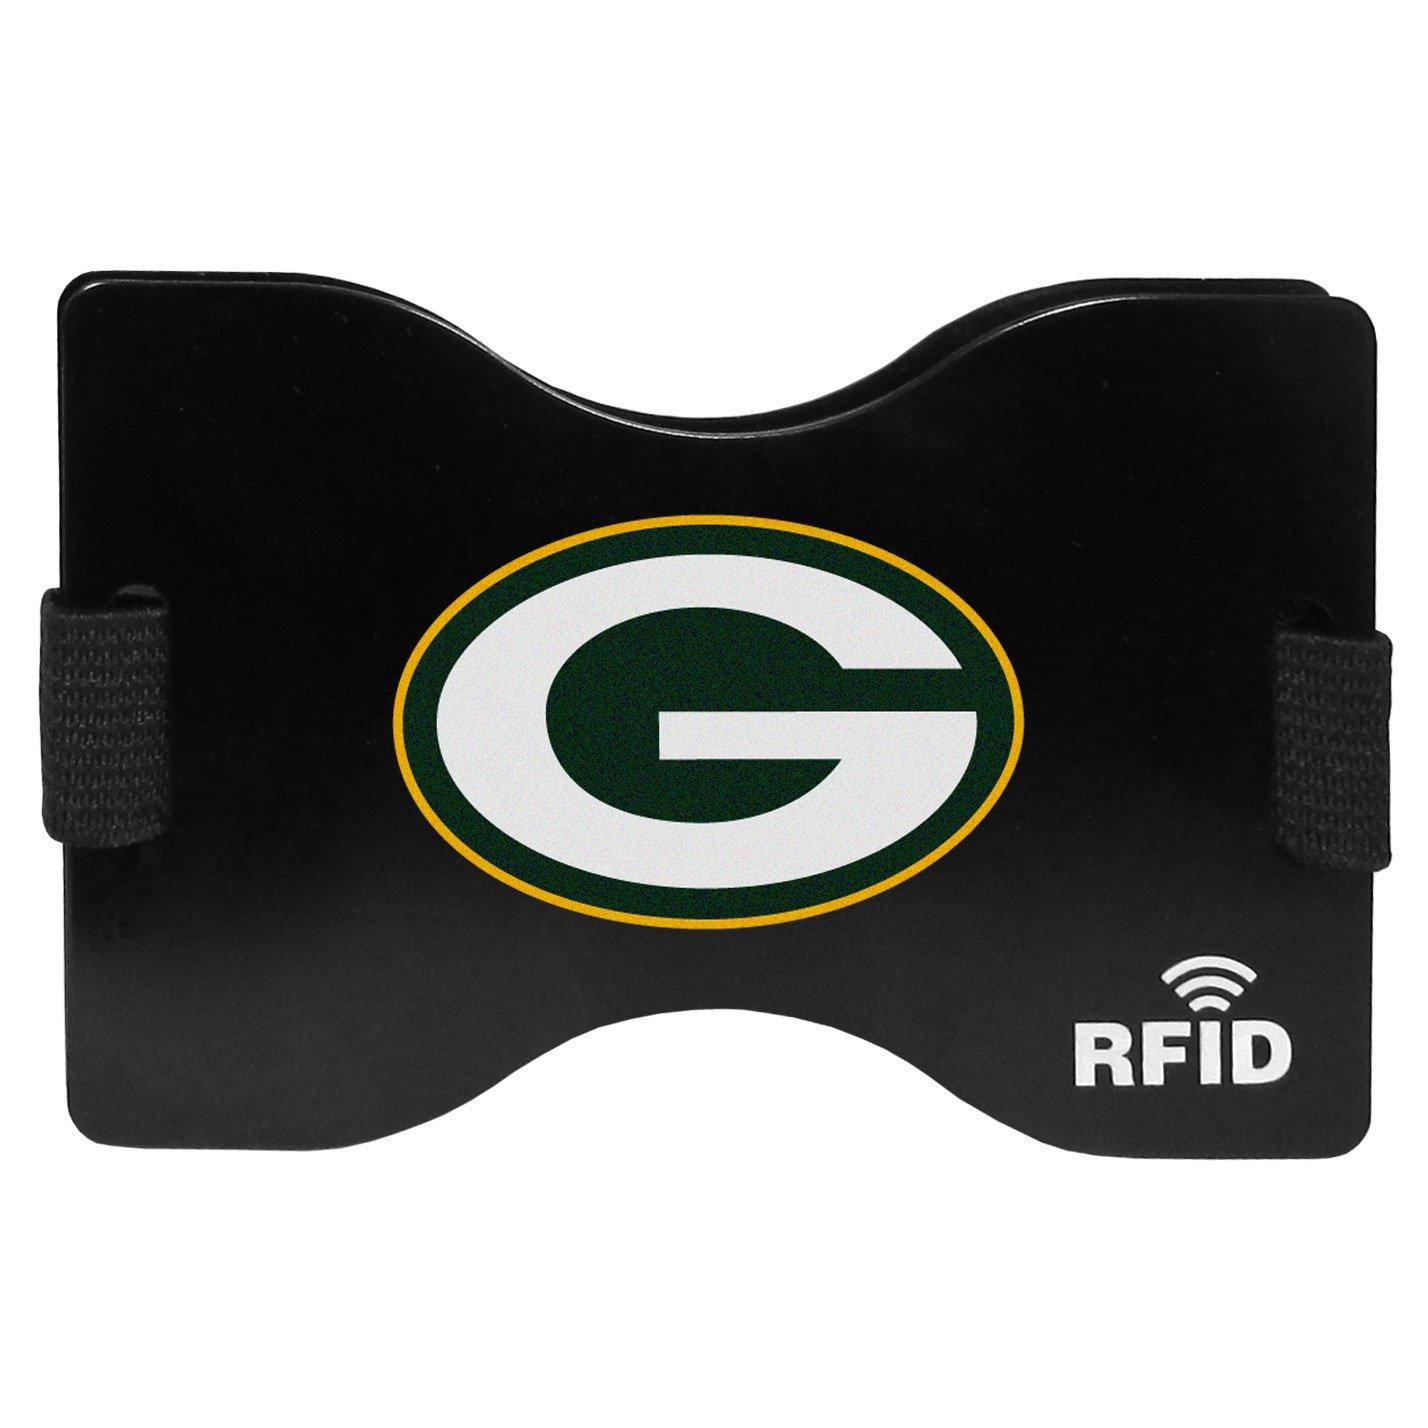 Siskiyou Sports Tennessee Titans RFID Wallet